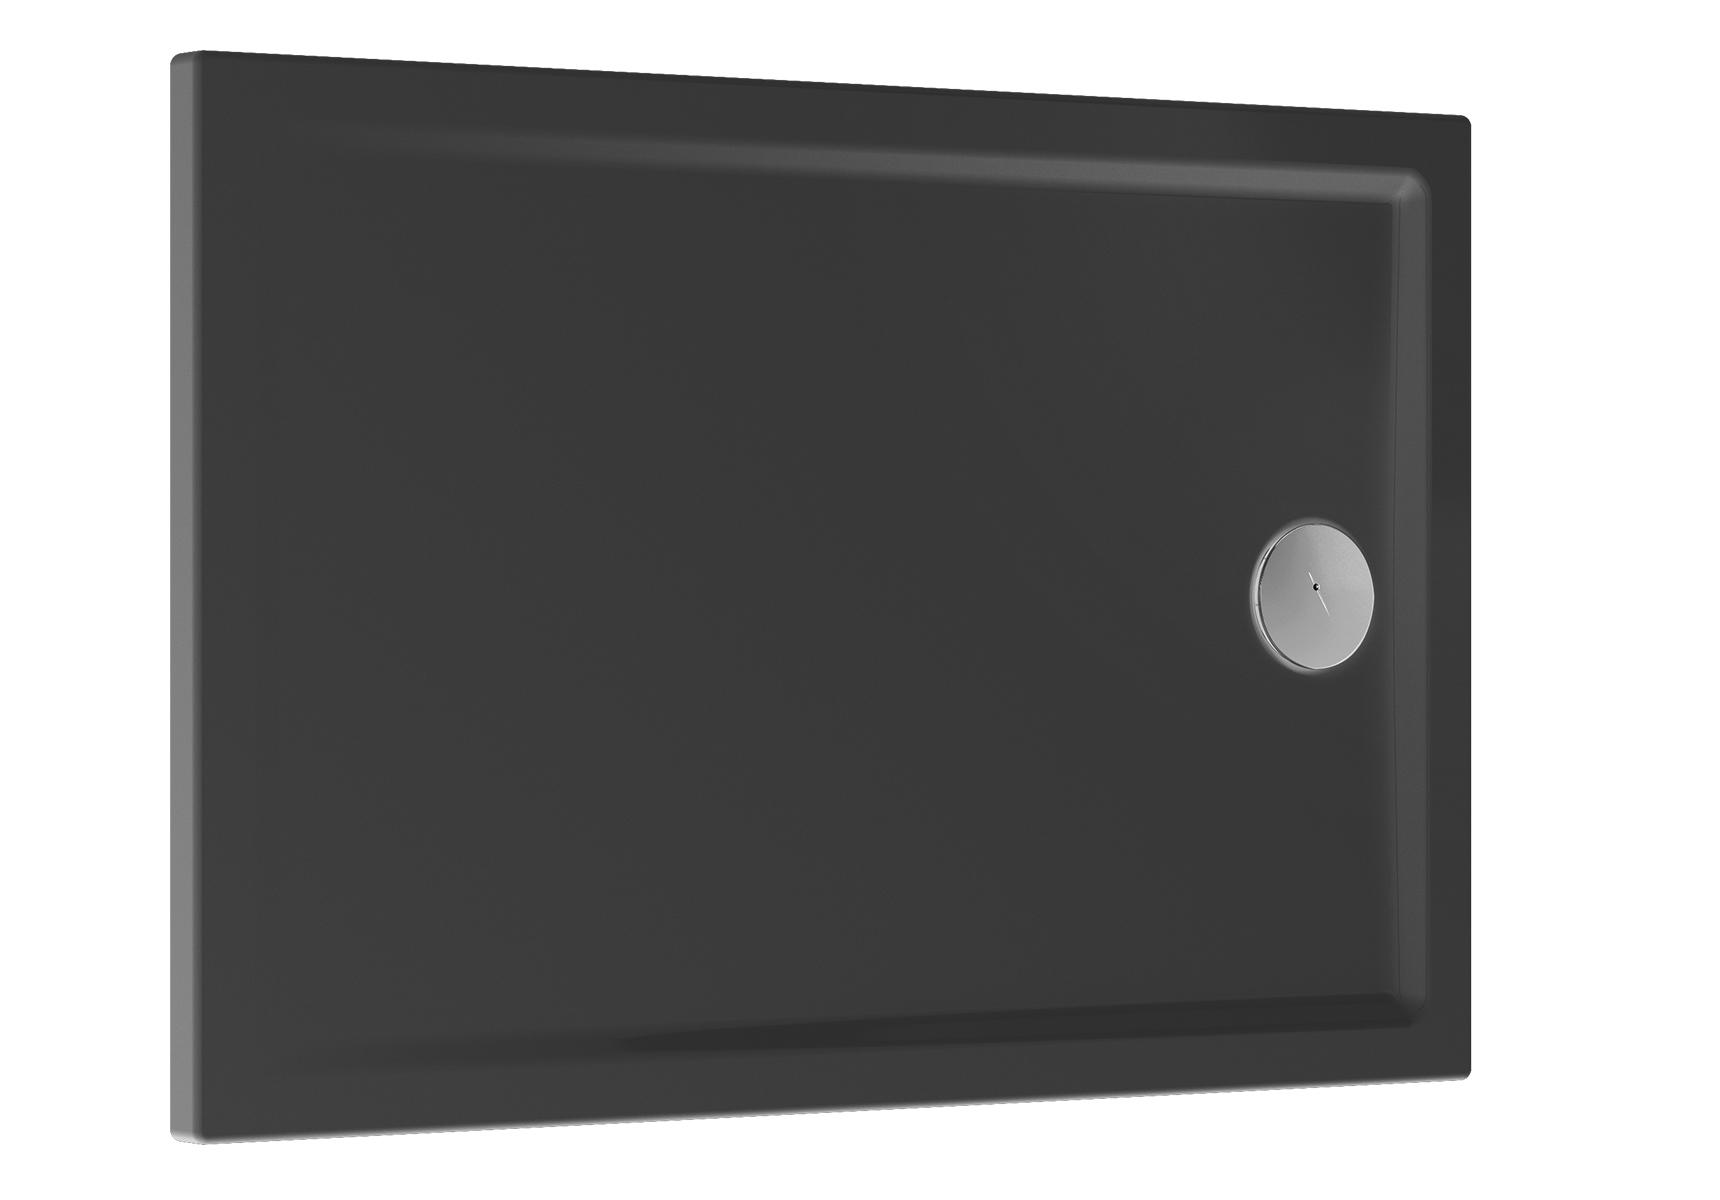 Cascade receveur ultra plat en céramique, 100  x  80 cm, anthraciteacite